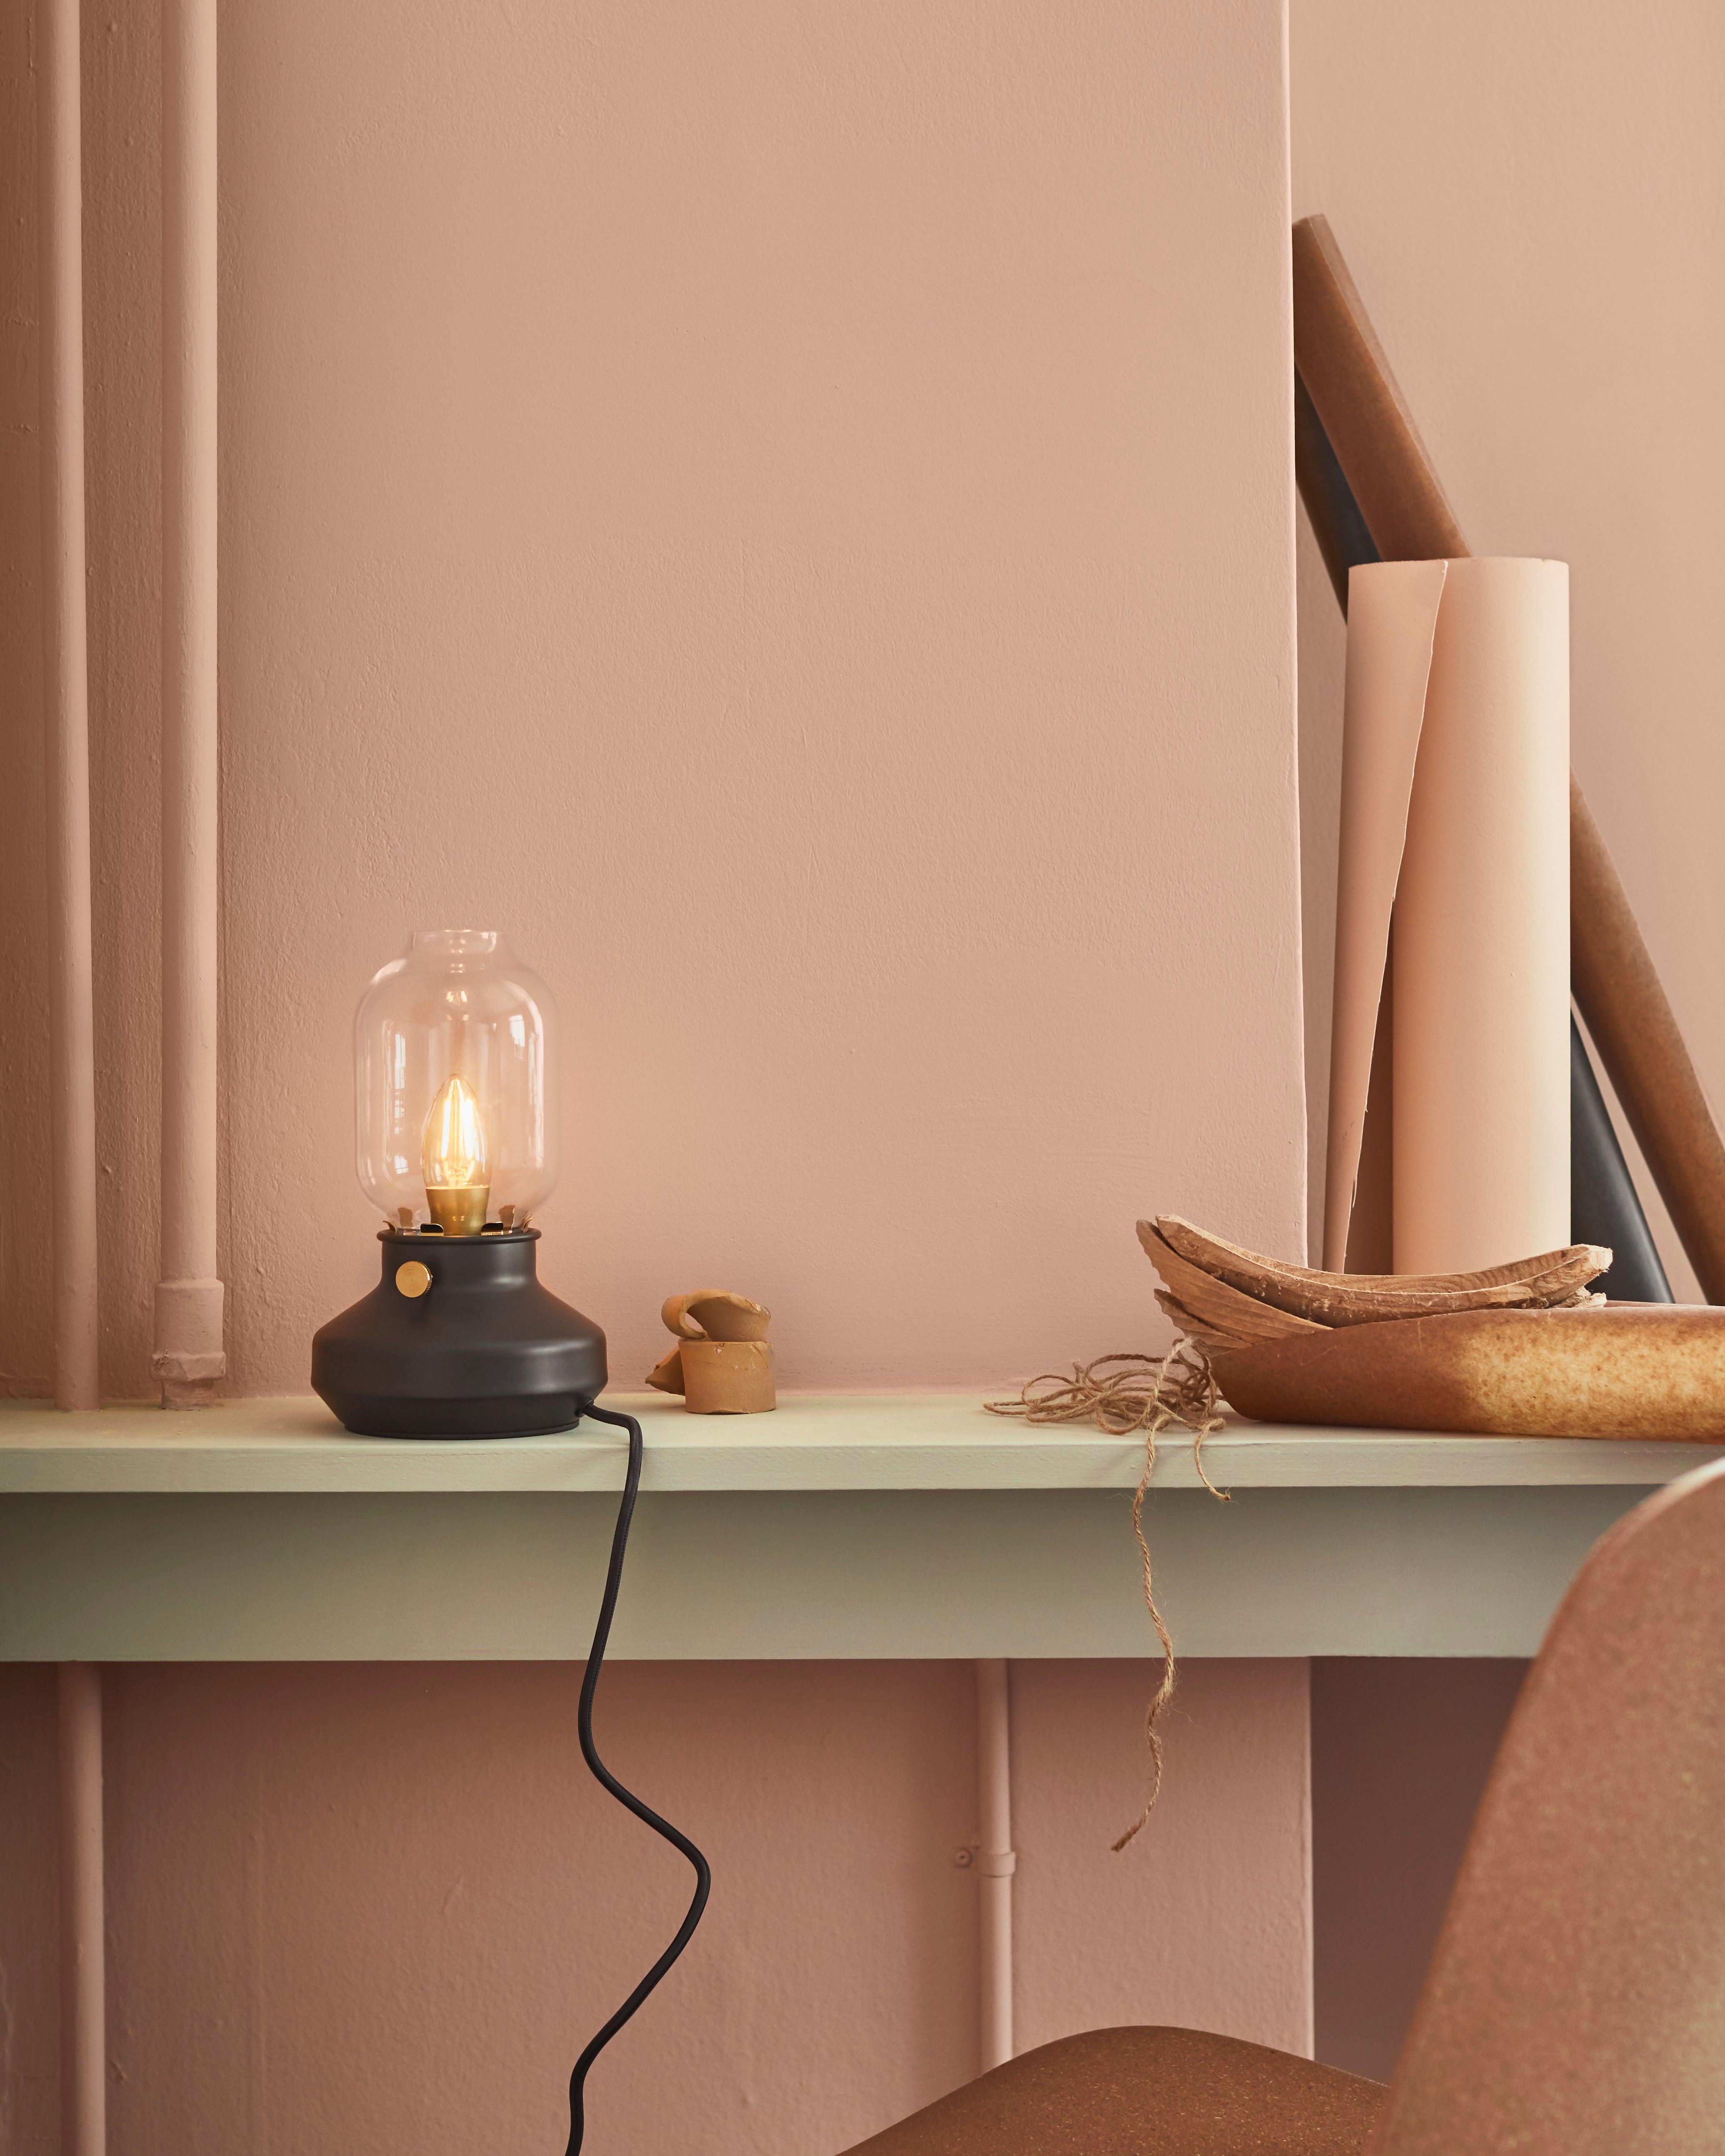 Ikea black lightbulb lamp